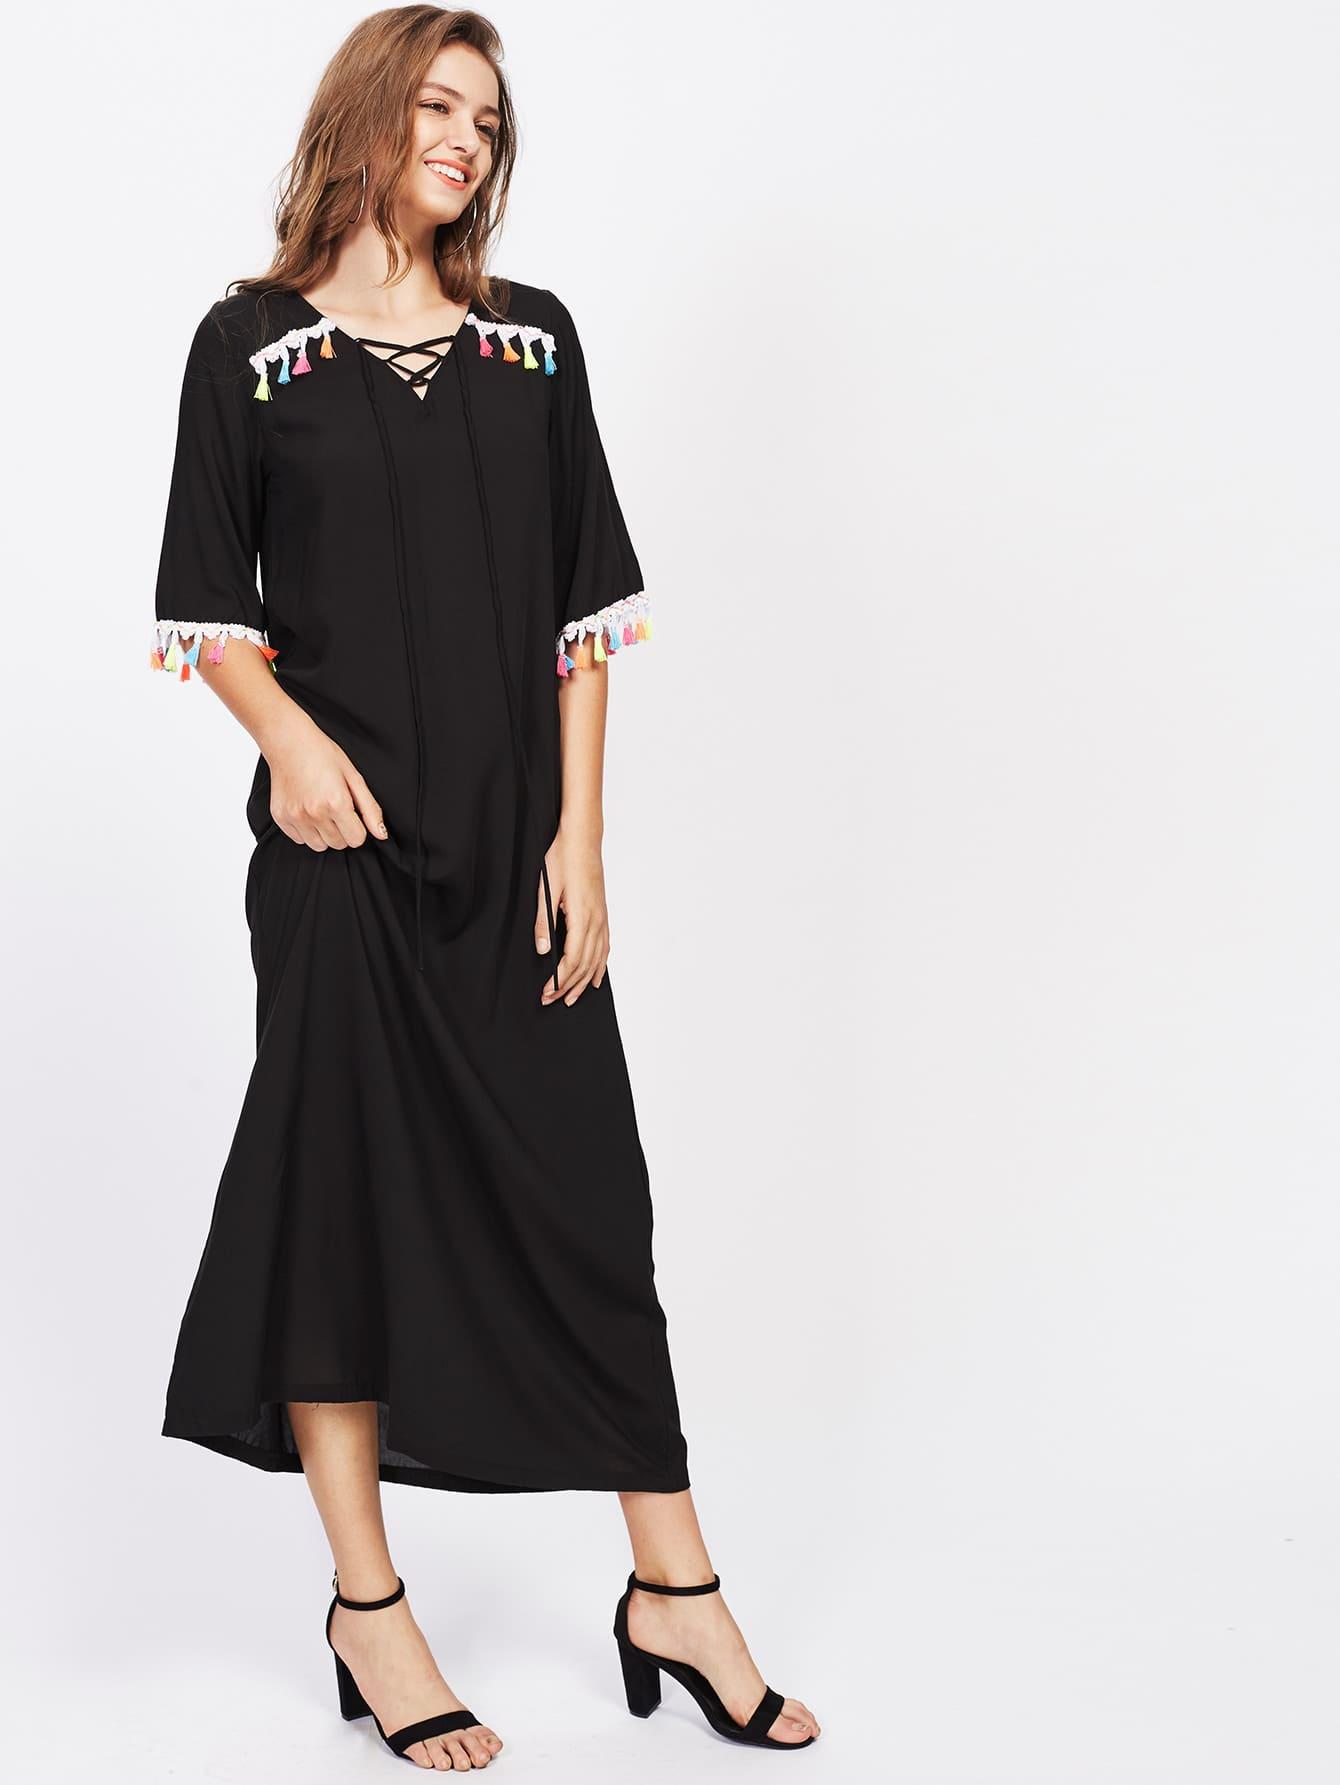 Lace Up Tassel Trim Below-Knee Hemlines Dress dress170615002